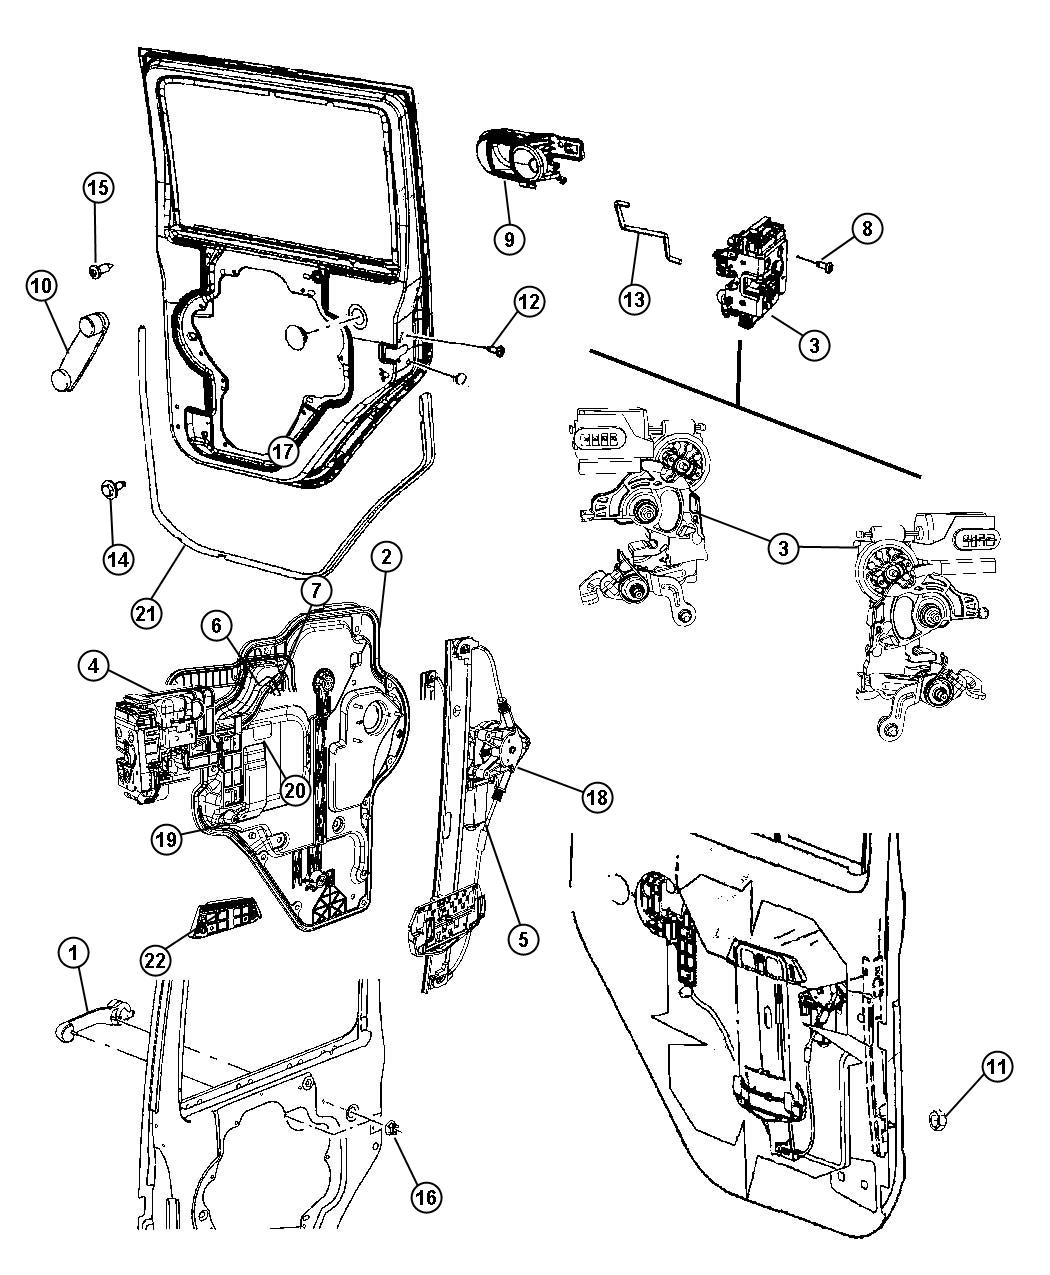 2013 jeep wrangler parts diagram 1993 jeep wrangler parts diagram wiring schematic 2013 jeep wrangler presenter. left. latch. rear door. [gcf ...